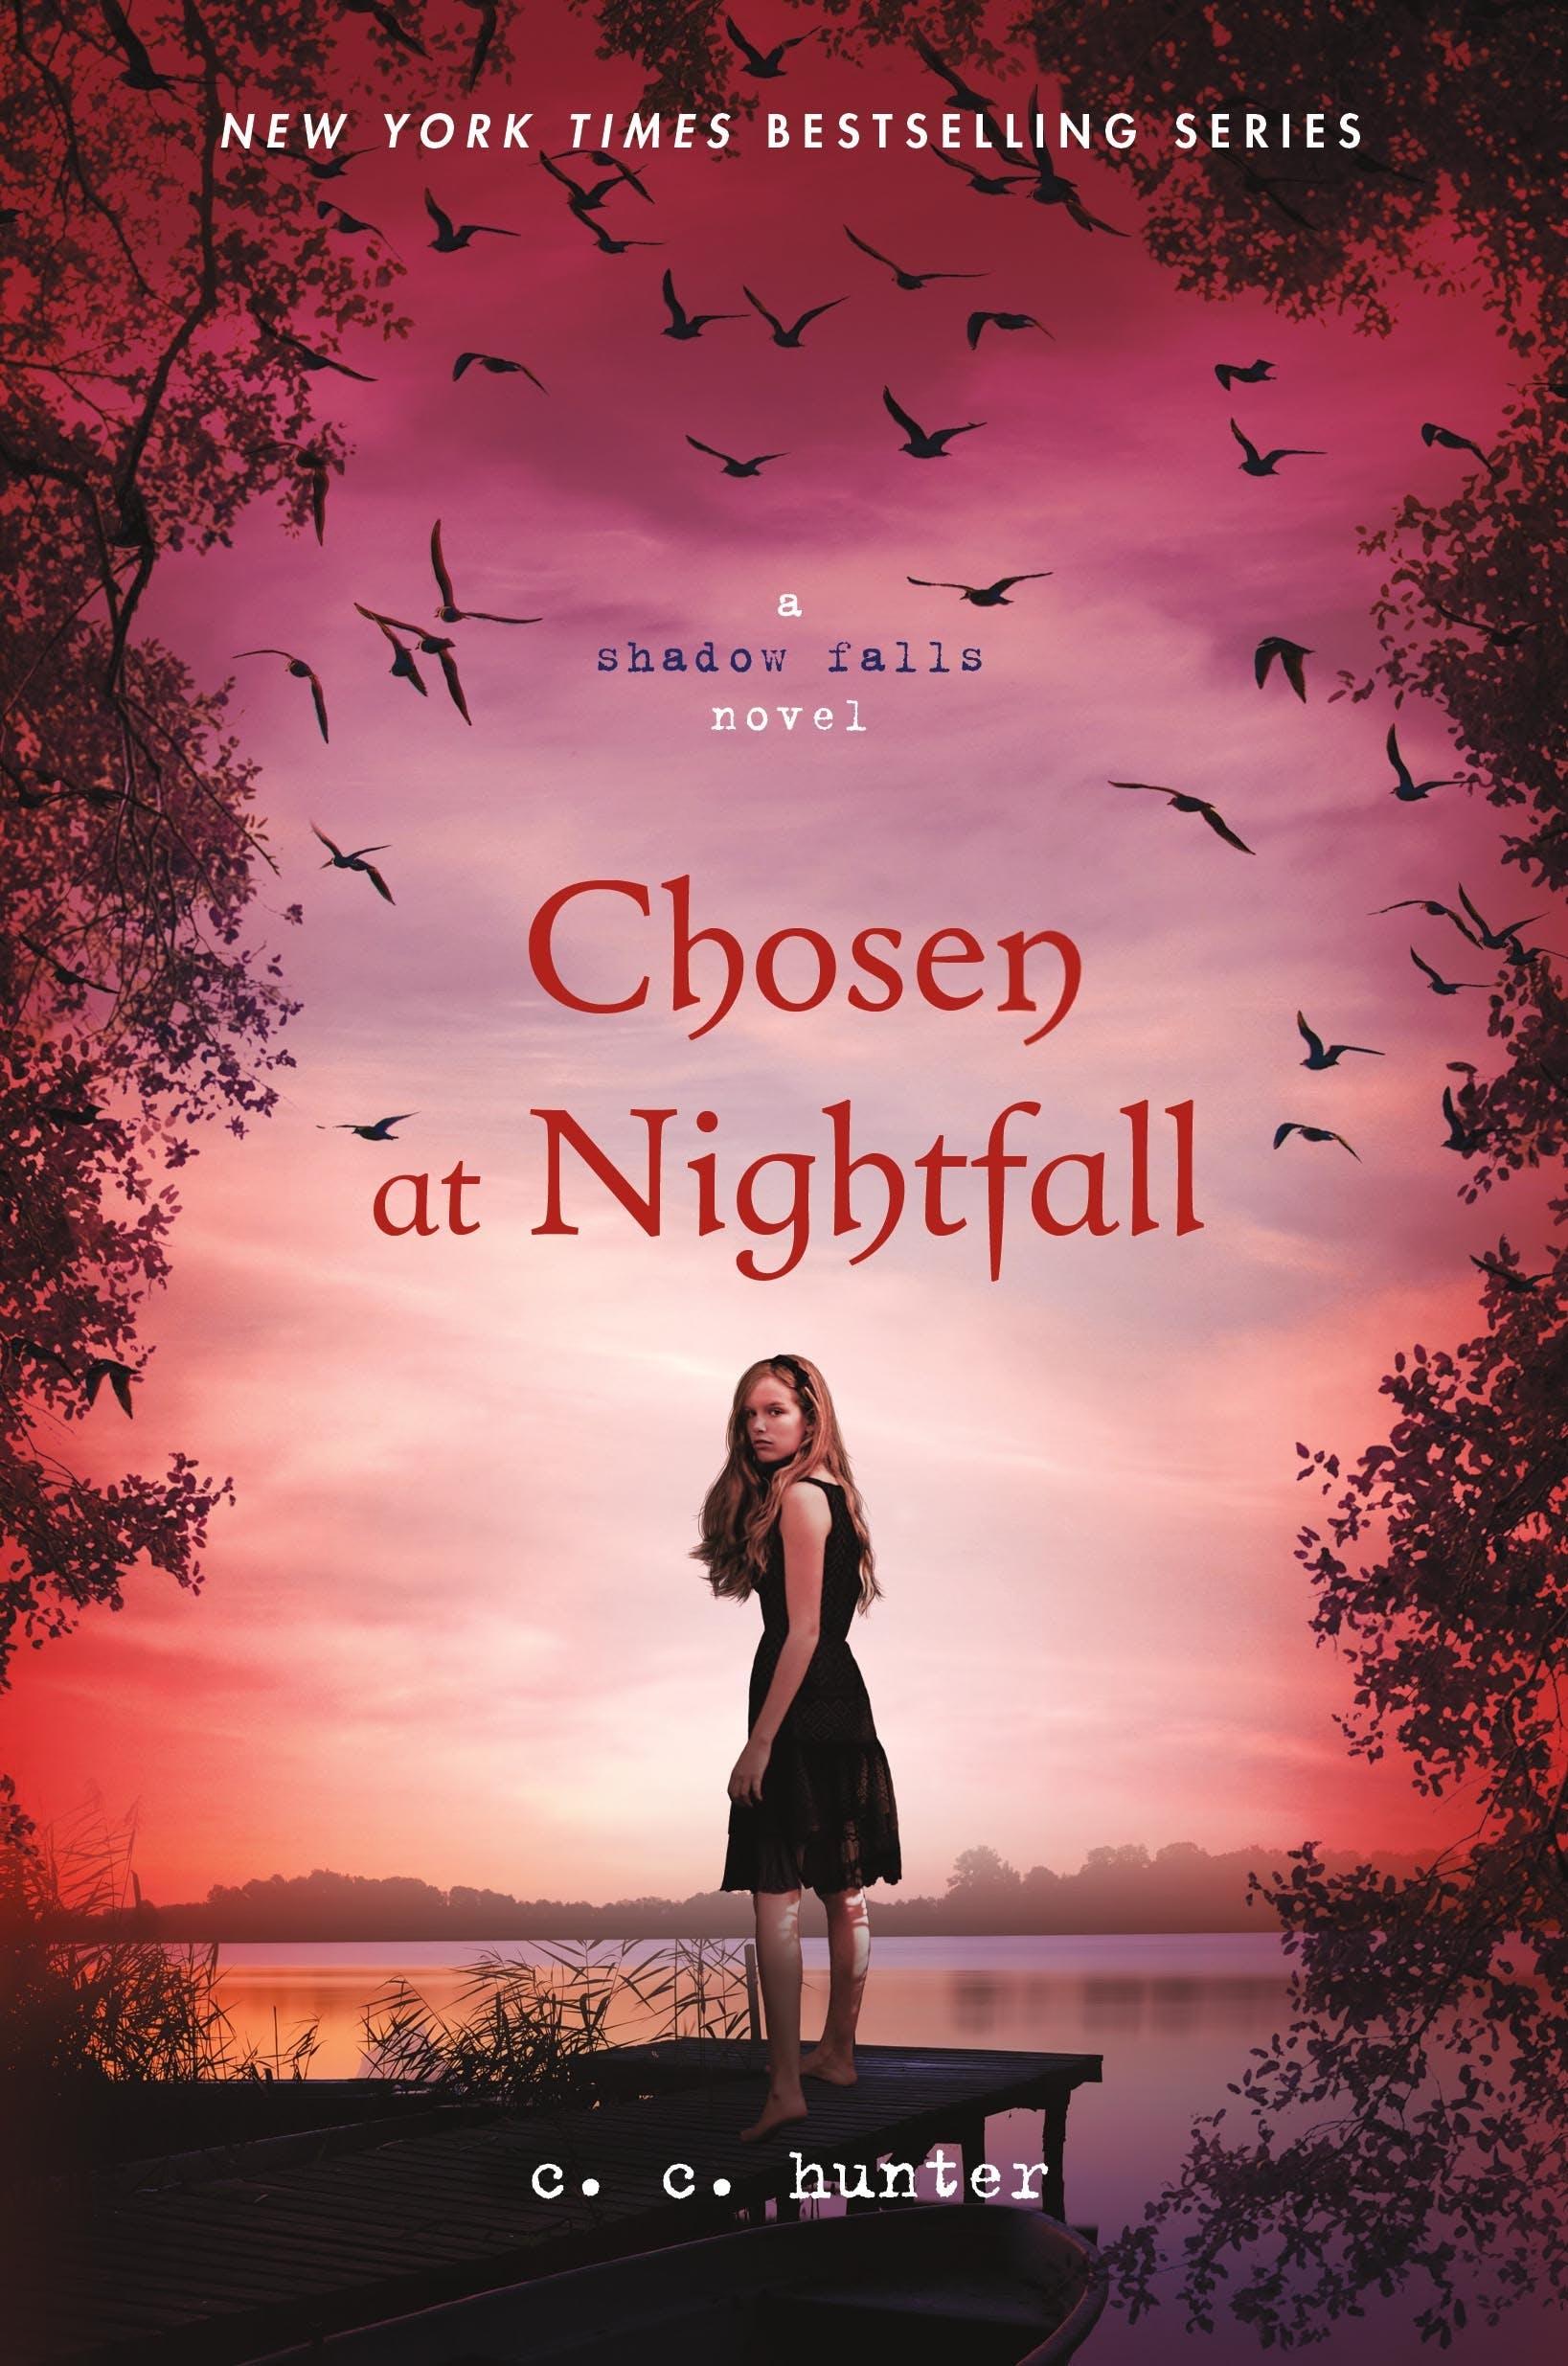 Image of Chosen at Nightfall